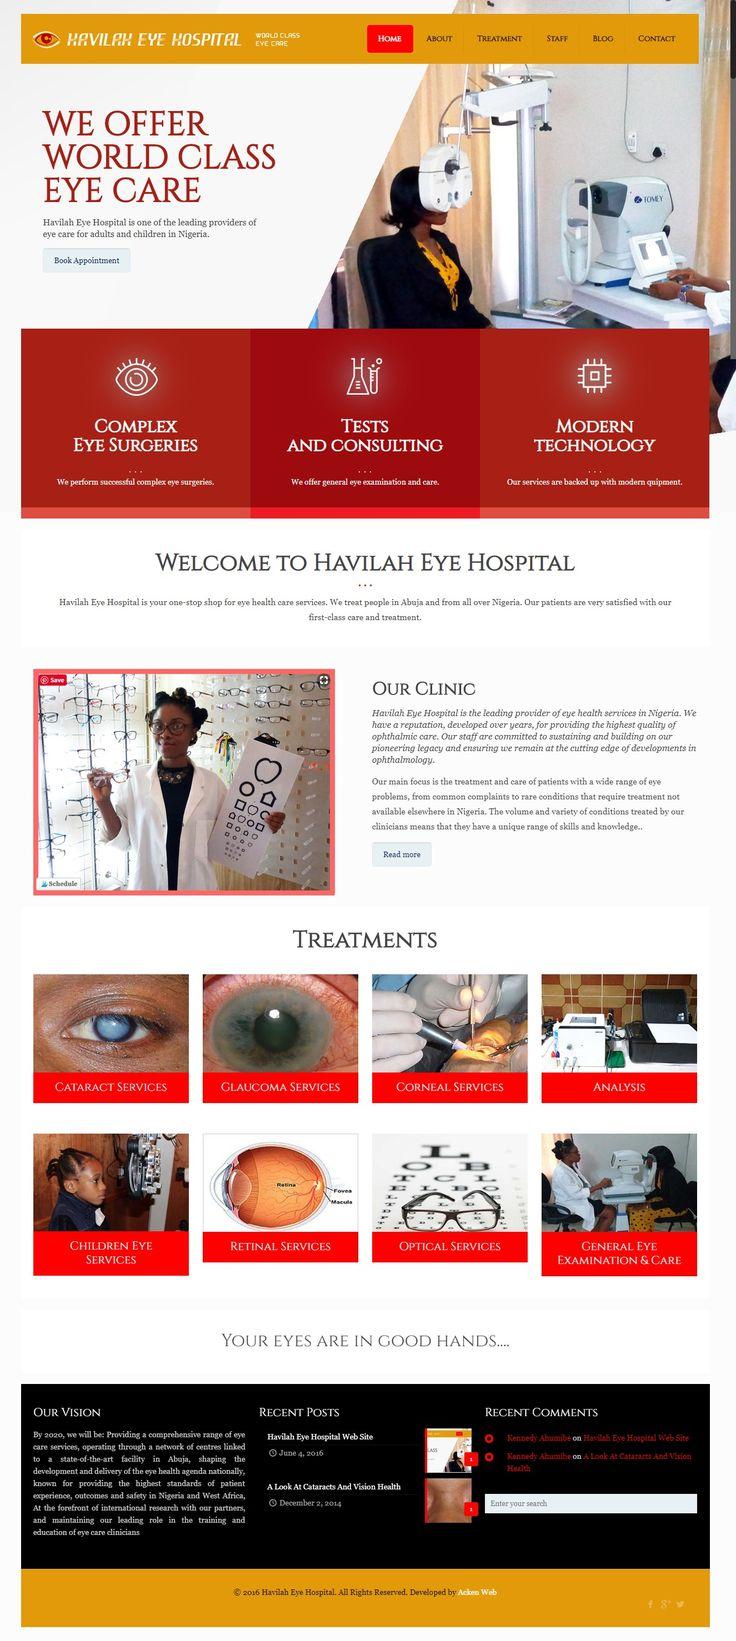 Havilah Eye Hospital Hospital, Clinic, Eye care